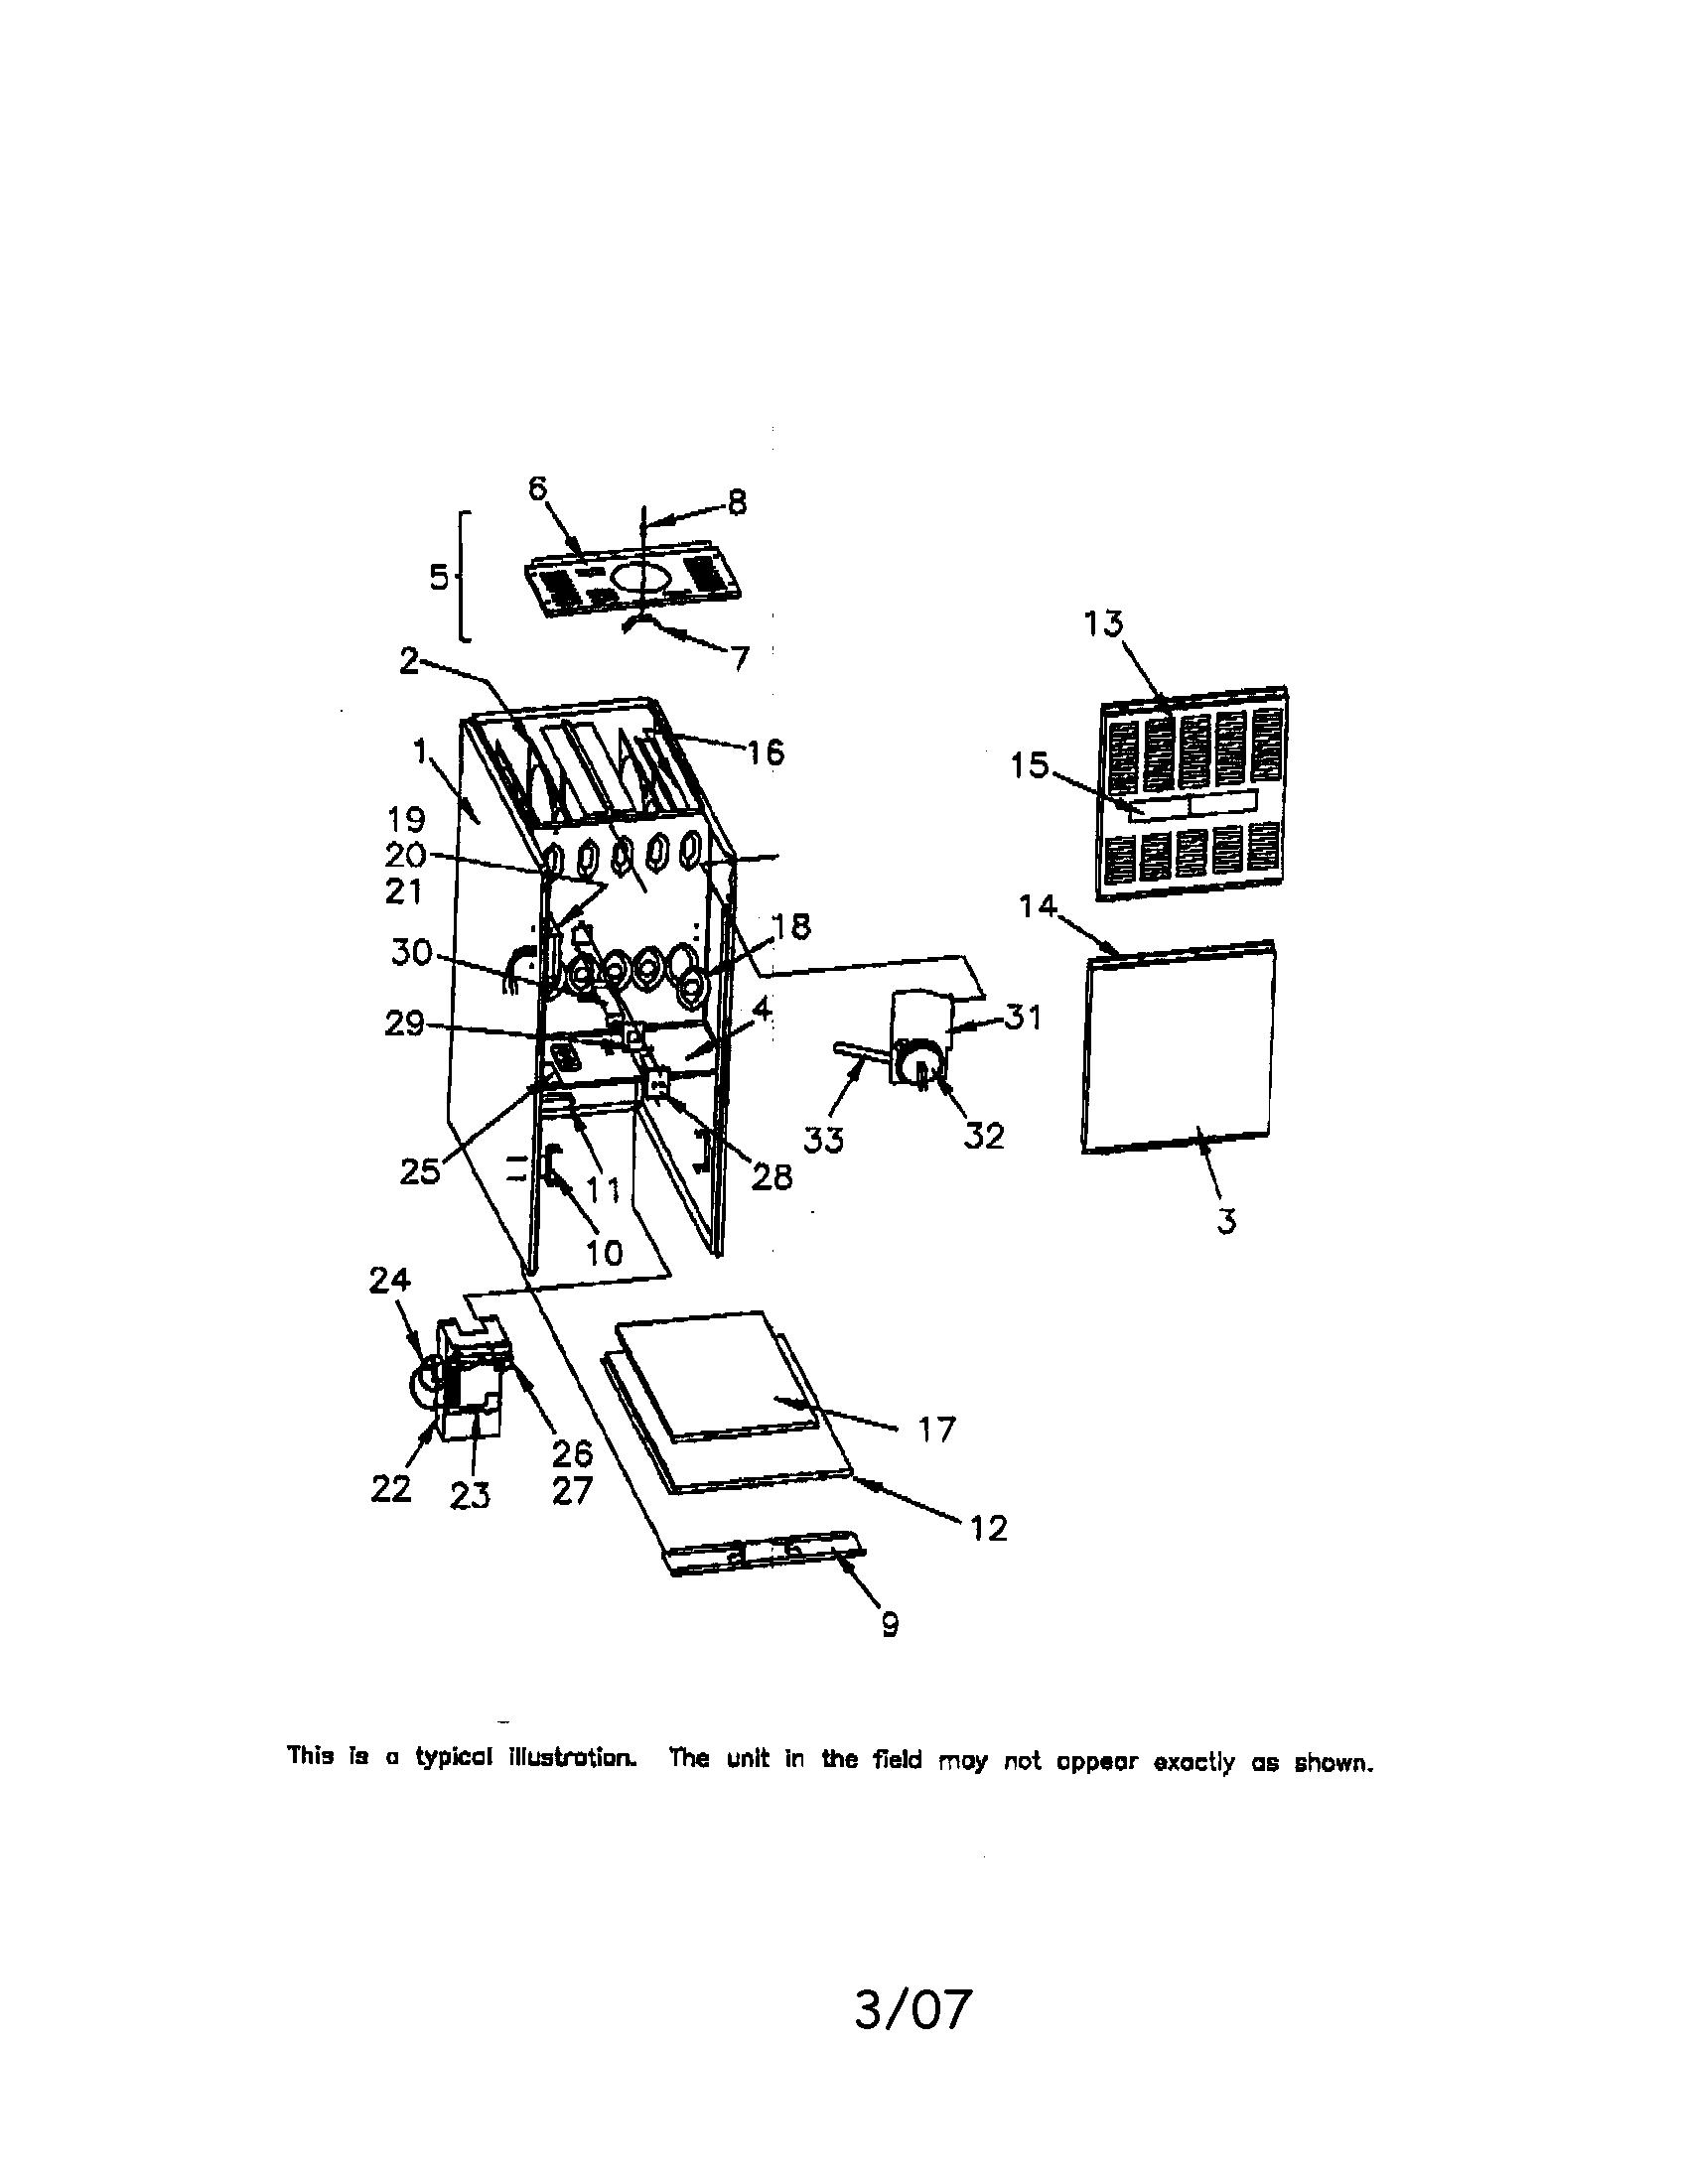 hight resolution of trane furnace schematics wiring diagram home trane furnace parts manual trane furnace diagram blog wiring diagram